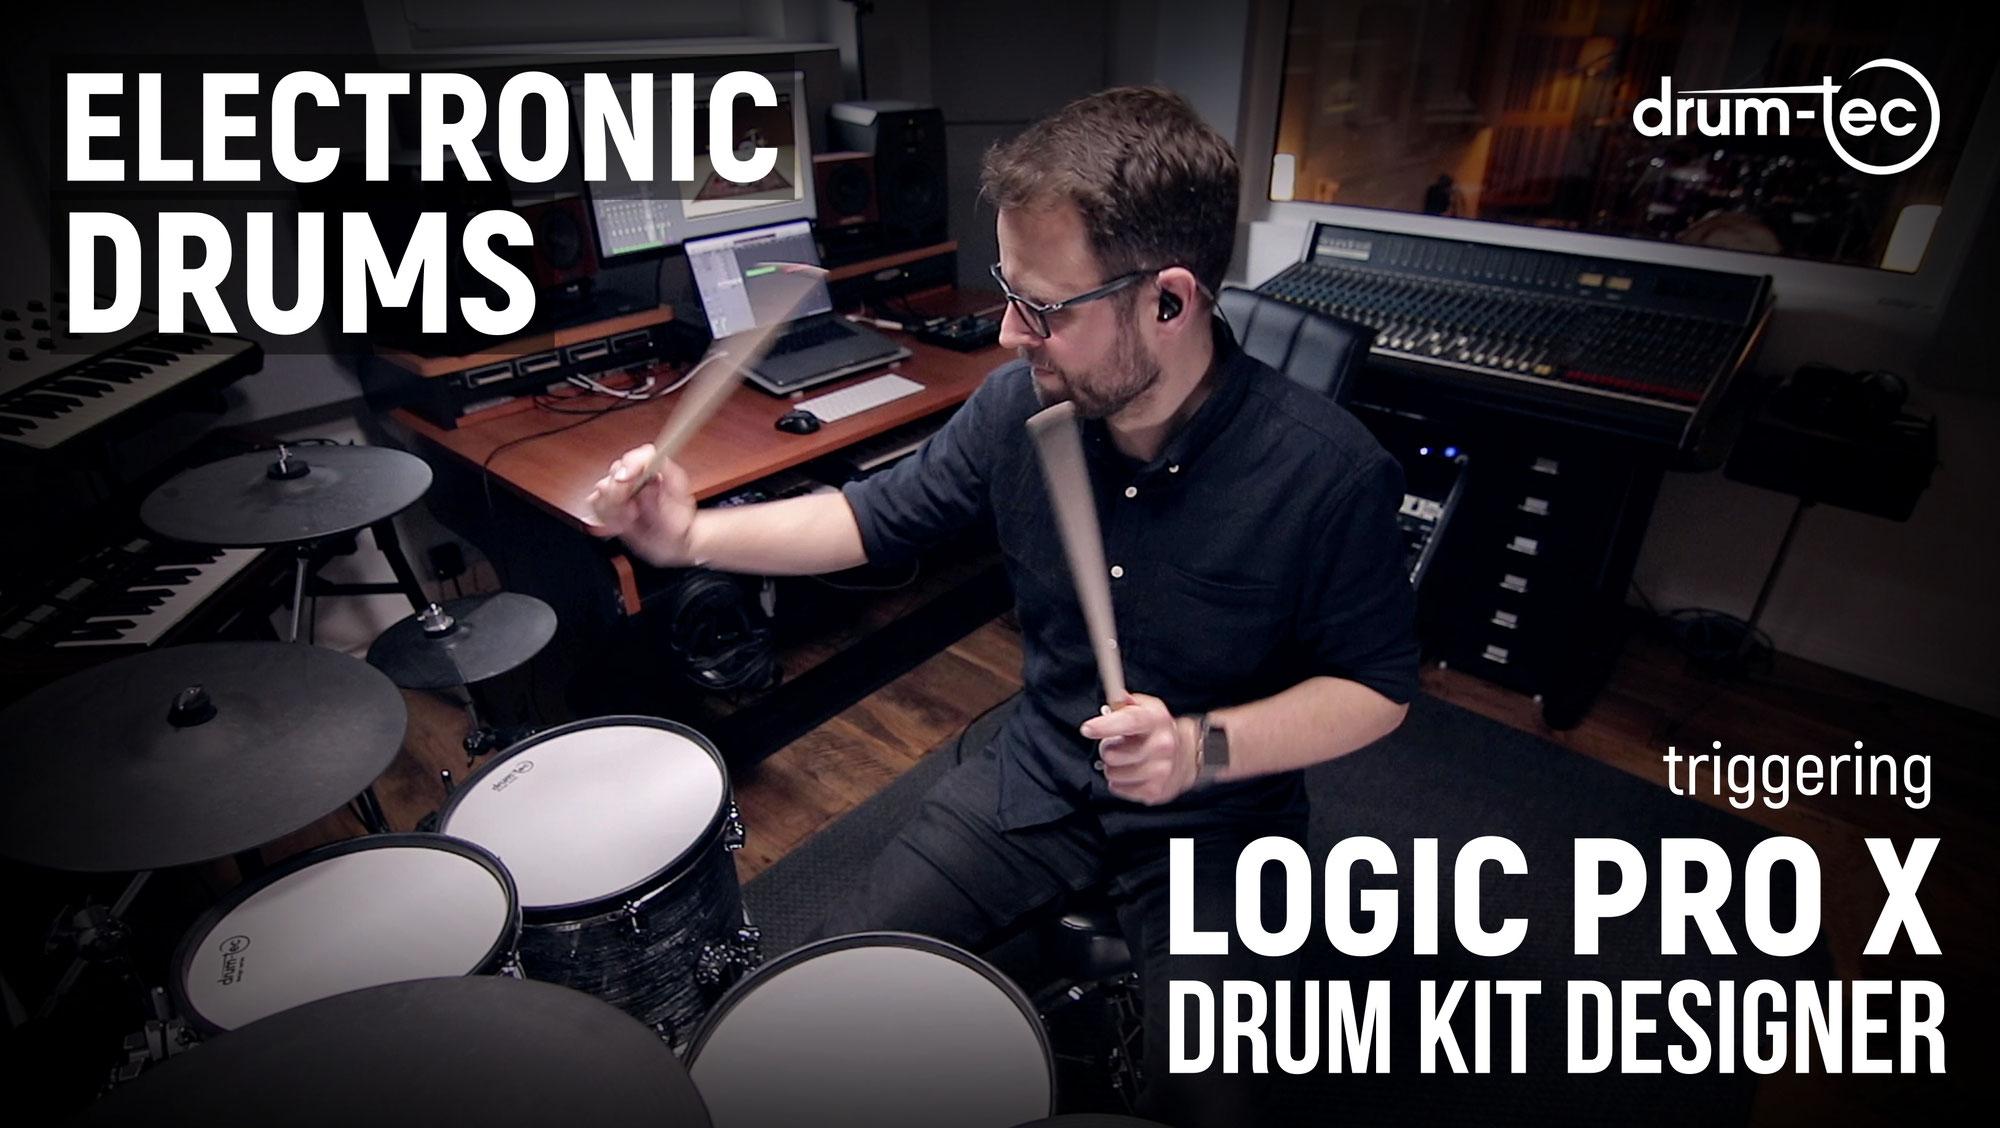 new drum-tec diabolo limited series @ Spytunes Studio B